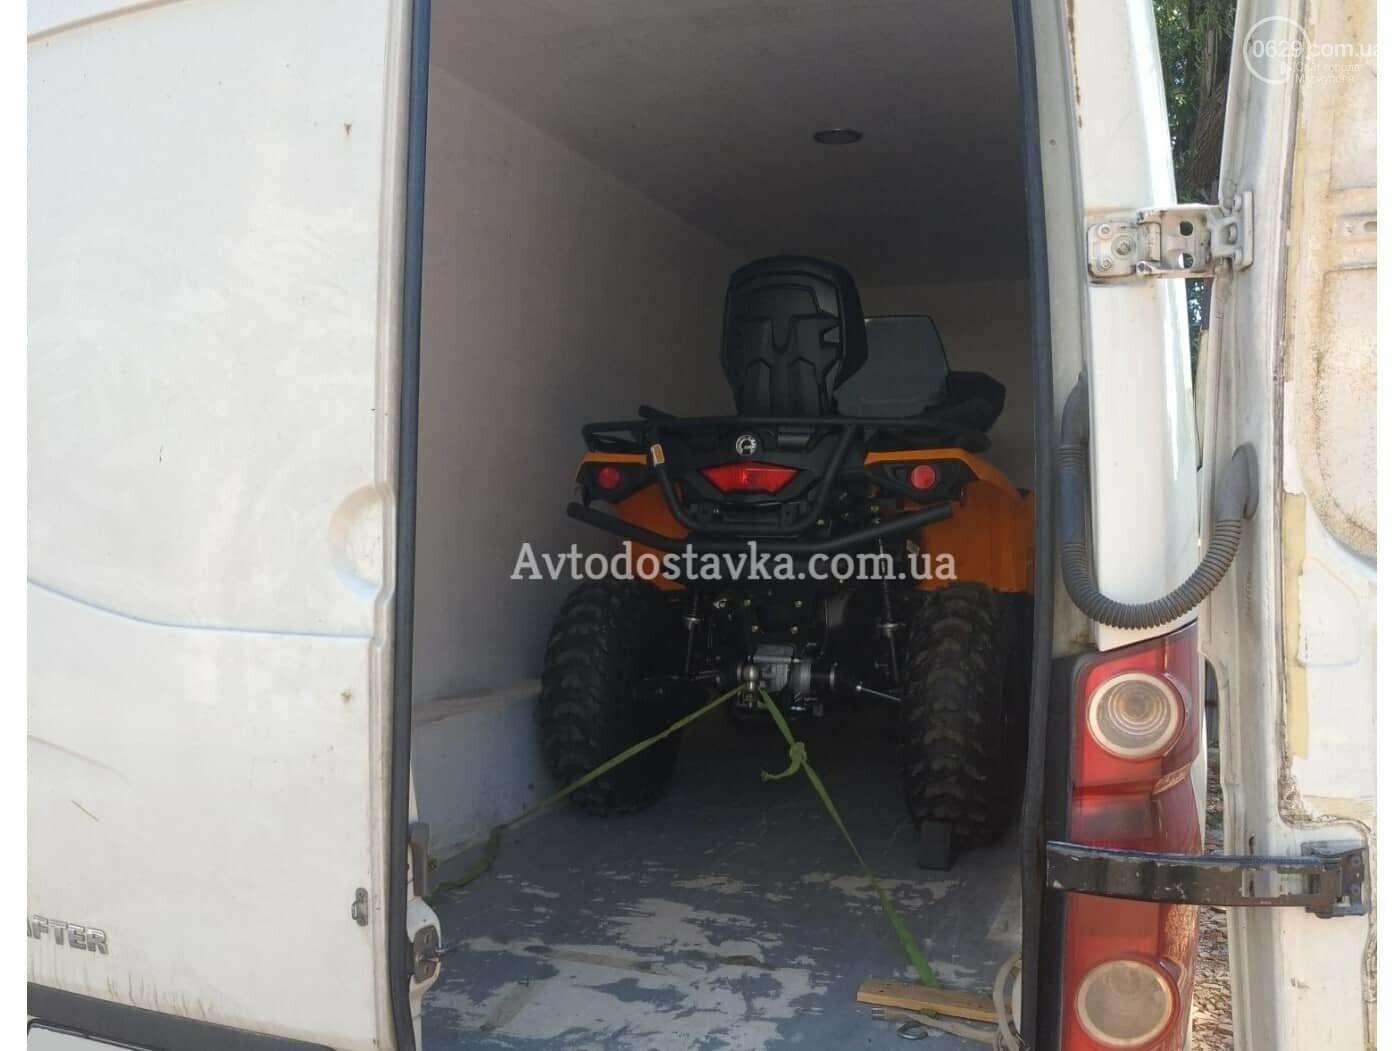 Перевозка мотоцикла по Украине - Автодоставка, фото-4